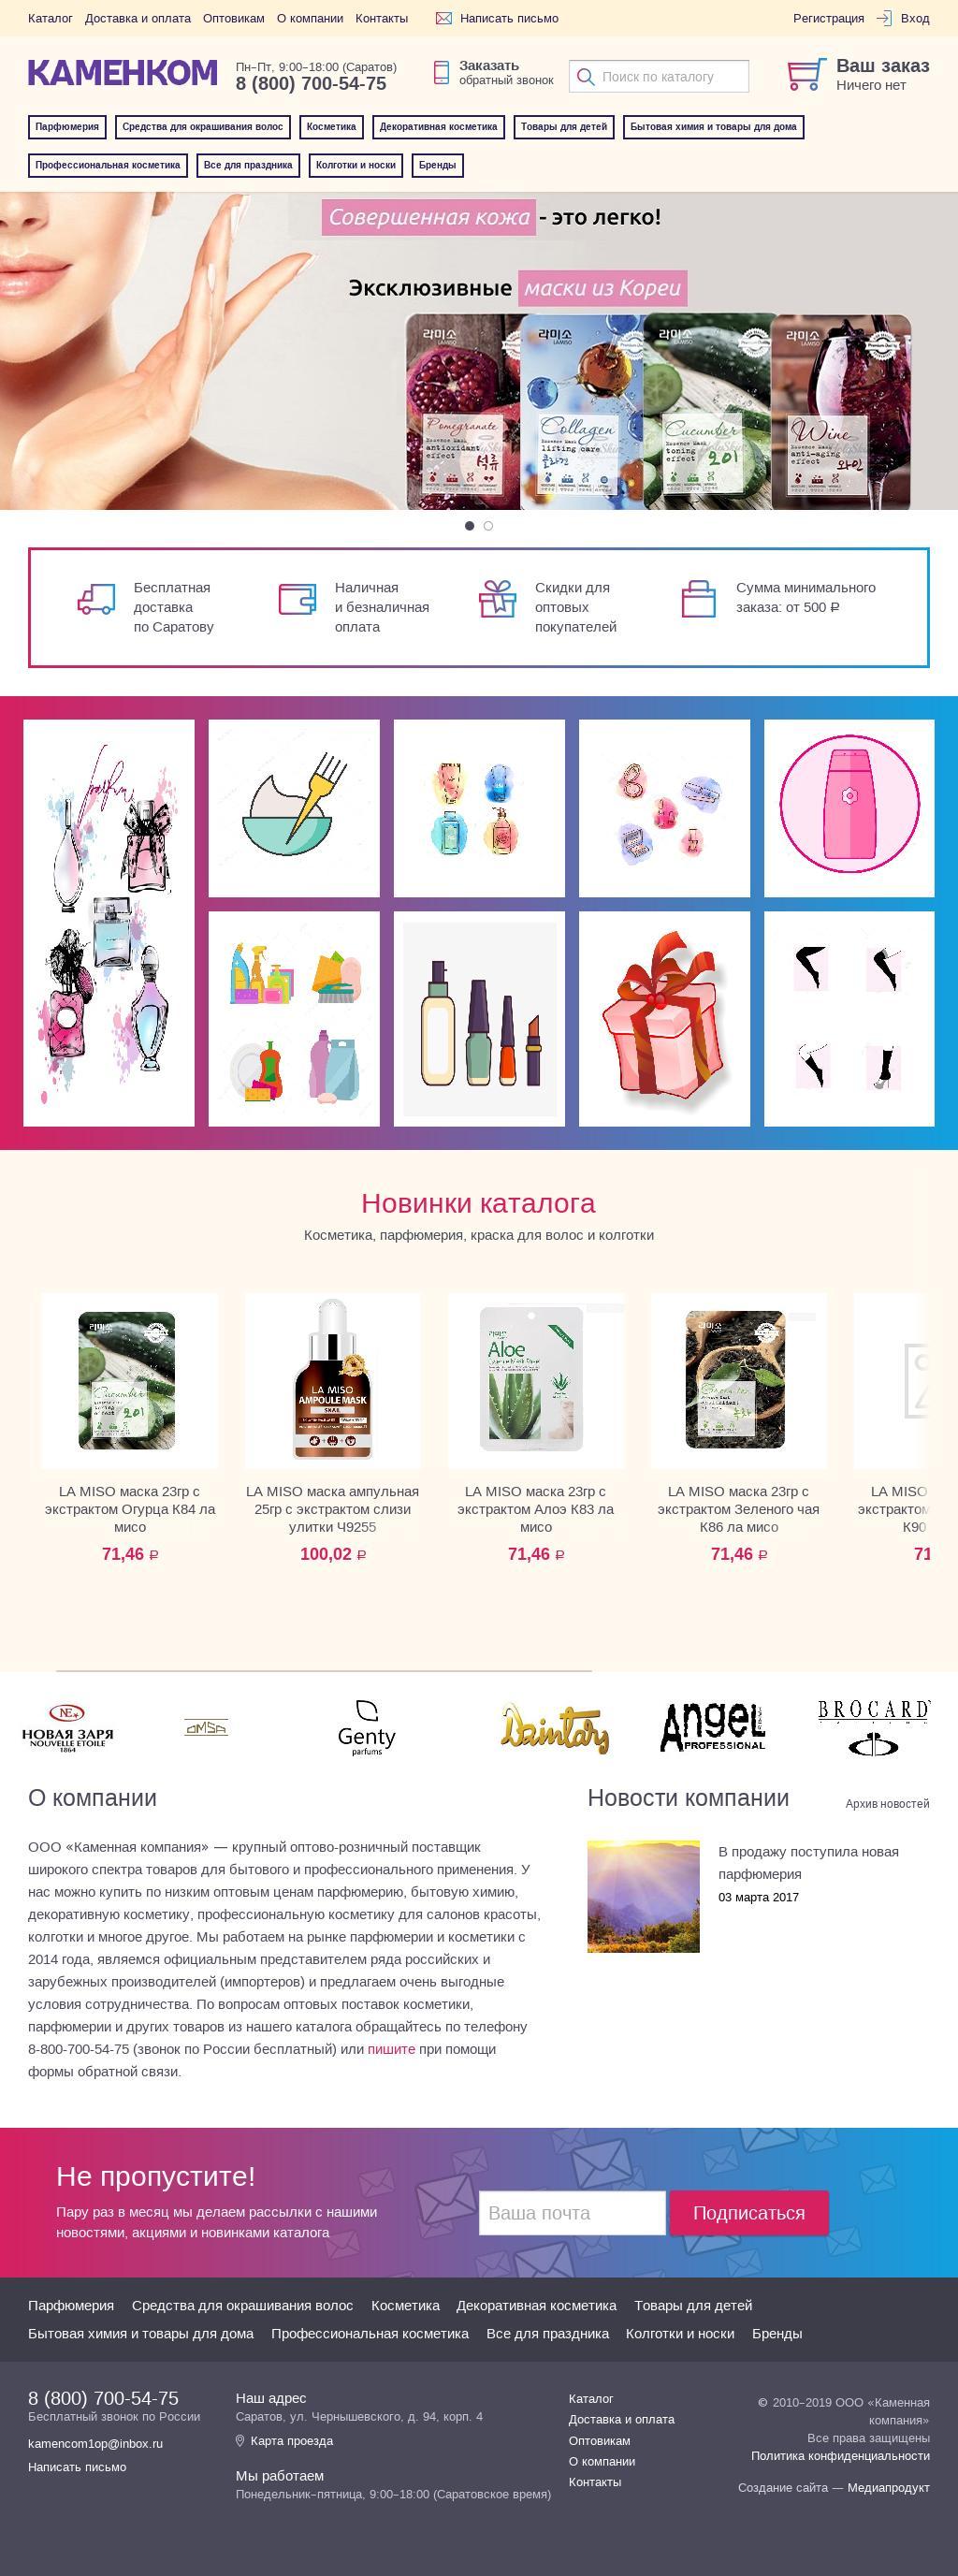 kosmetika-optom-parfum.ru